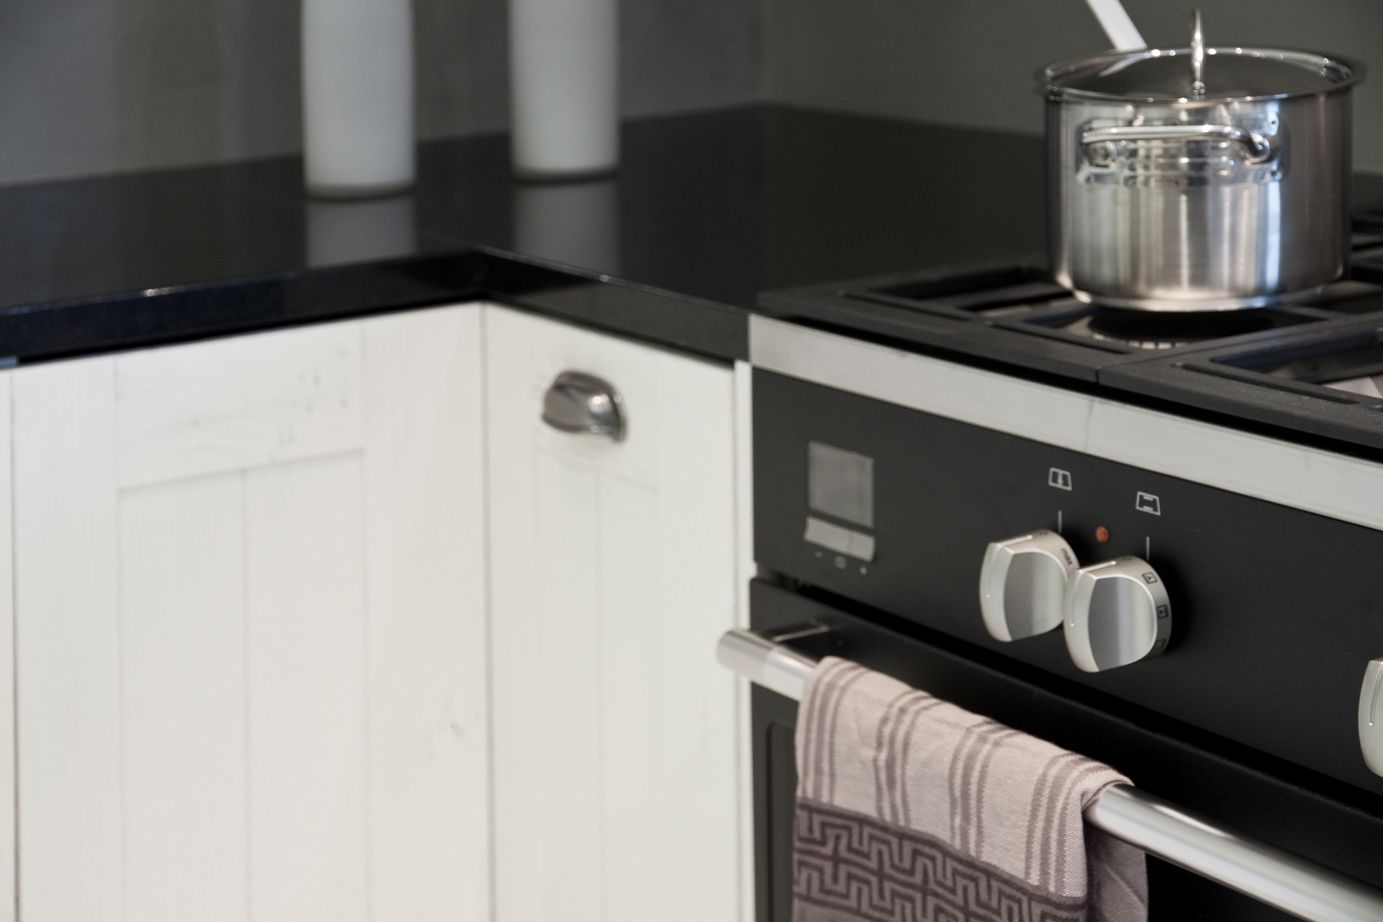 Stoere Keuken Wood : Moderne keuken met kast en stoere tafel jantien